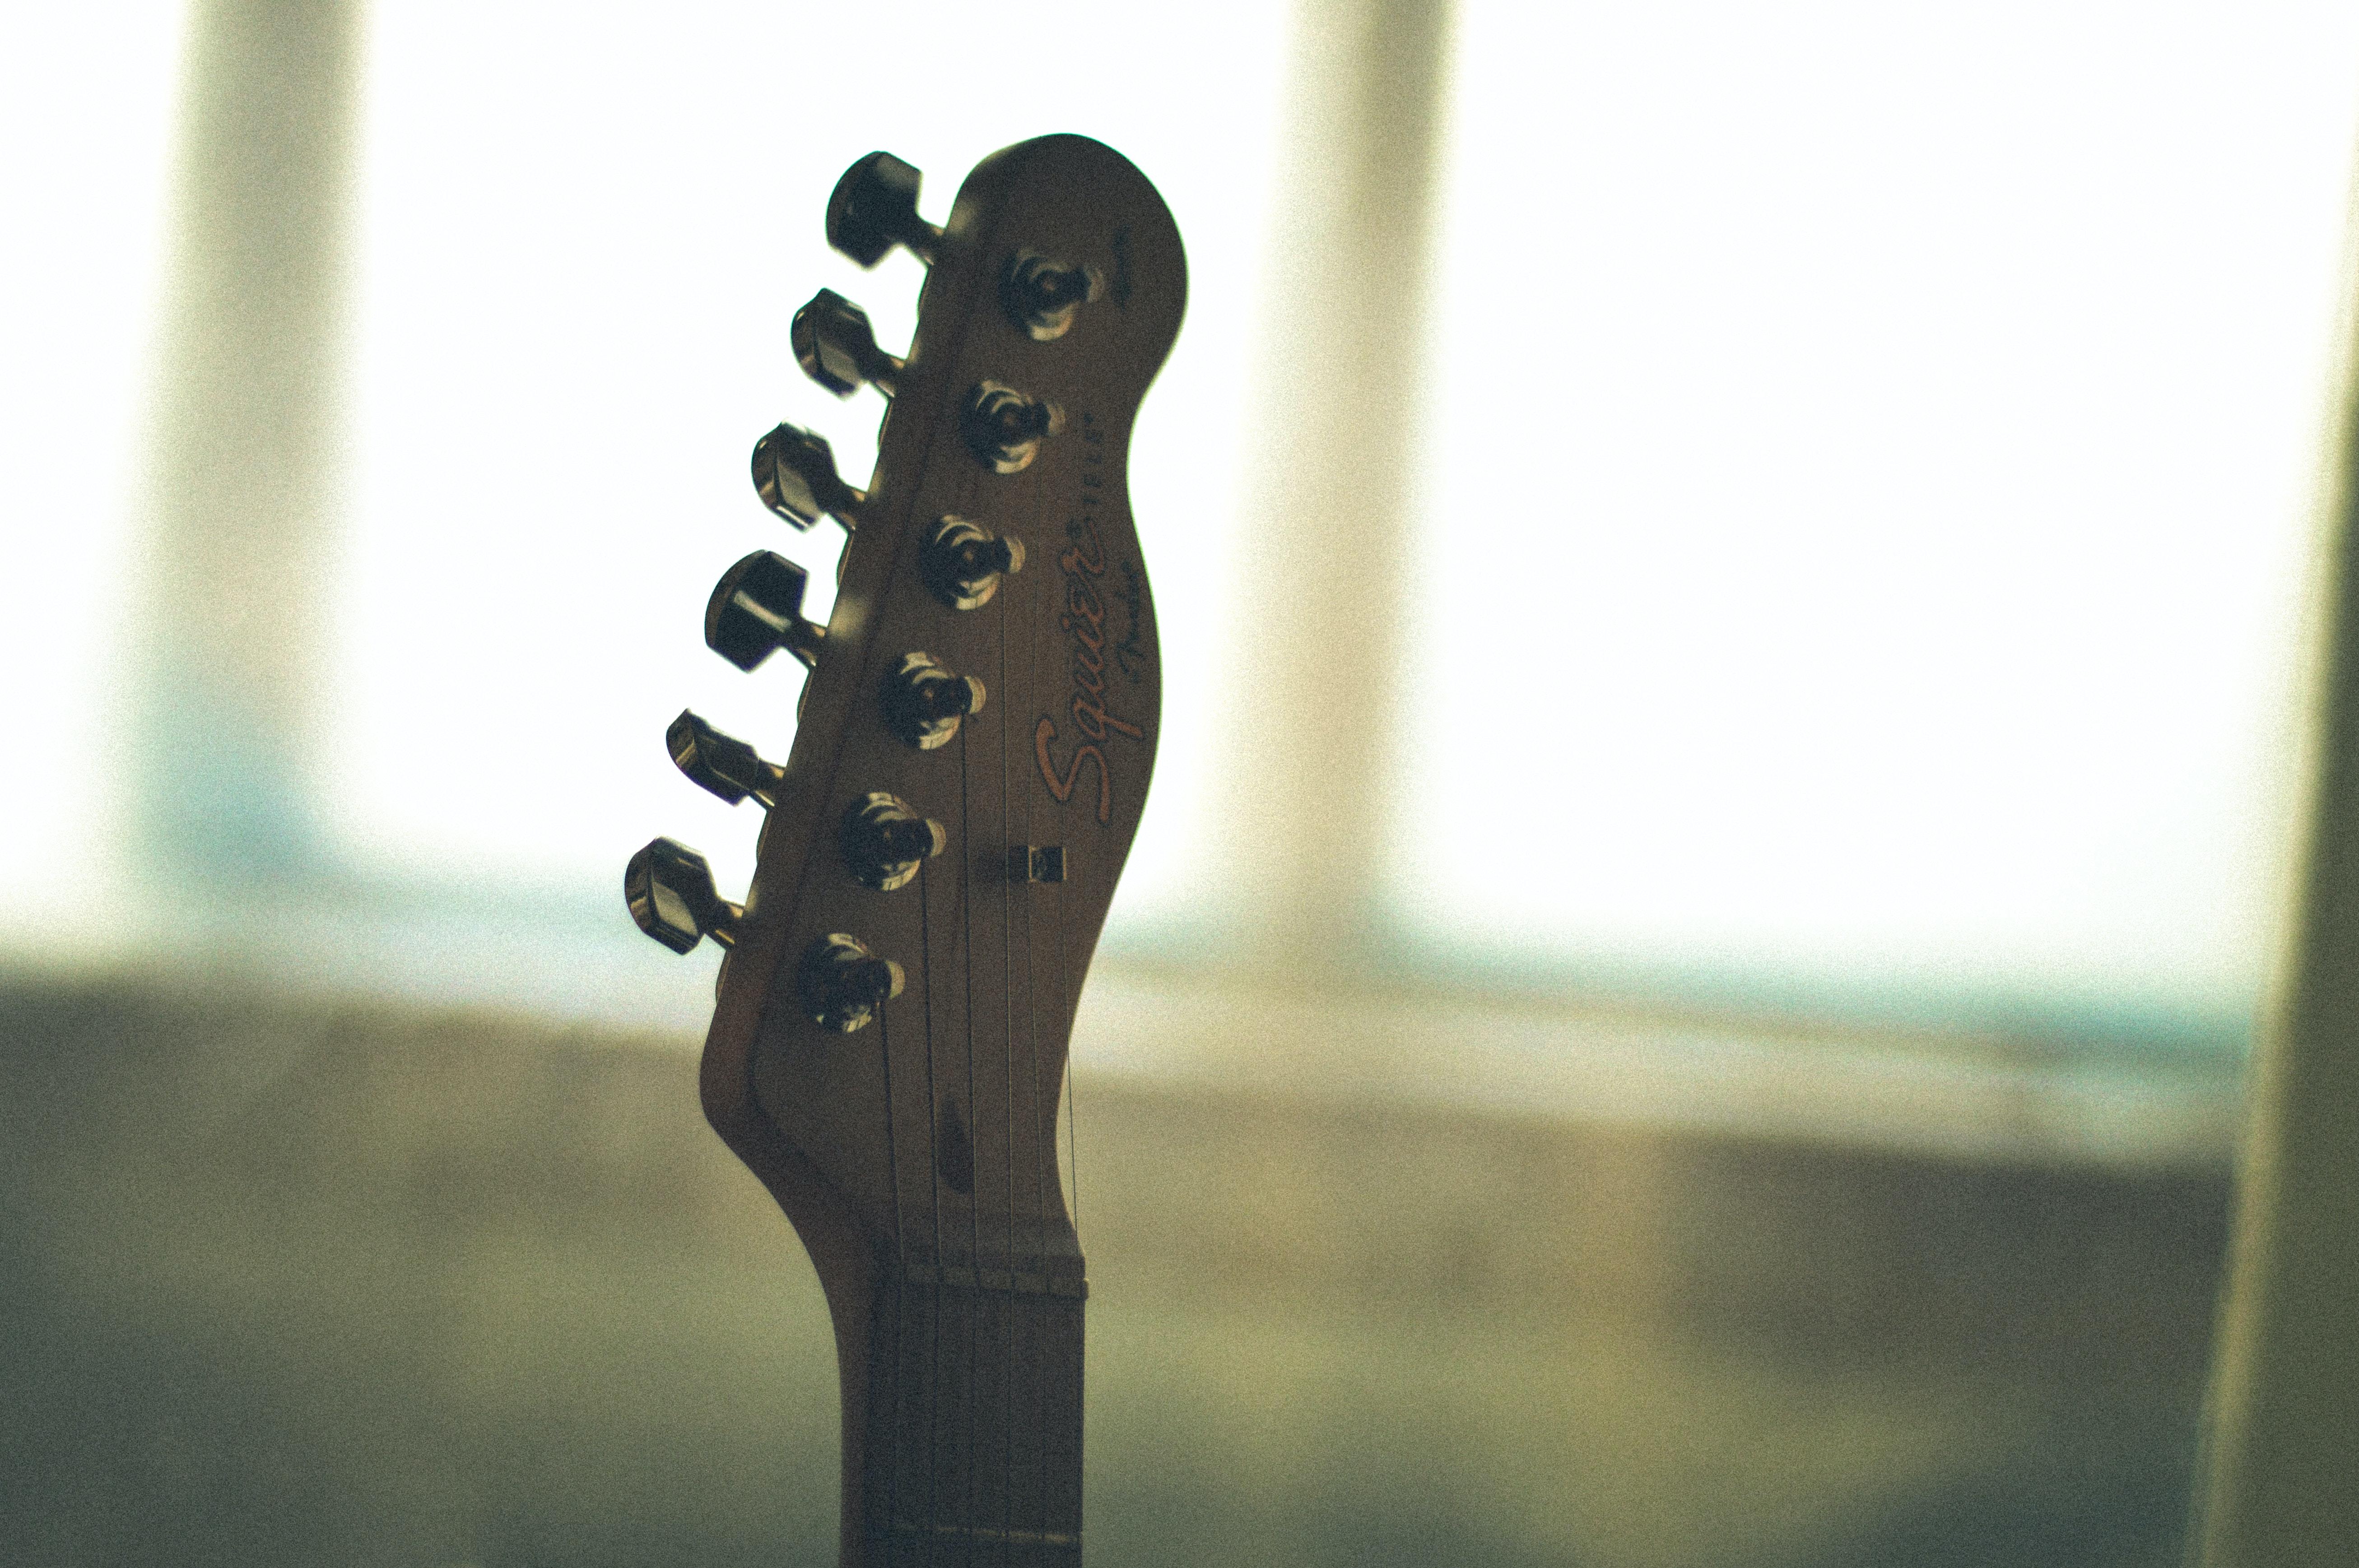 4kの壁紙 エレキギター ギターの無料の写真素材